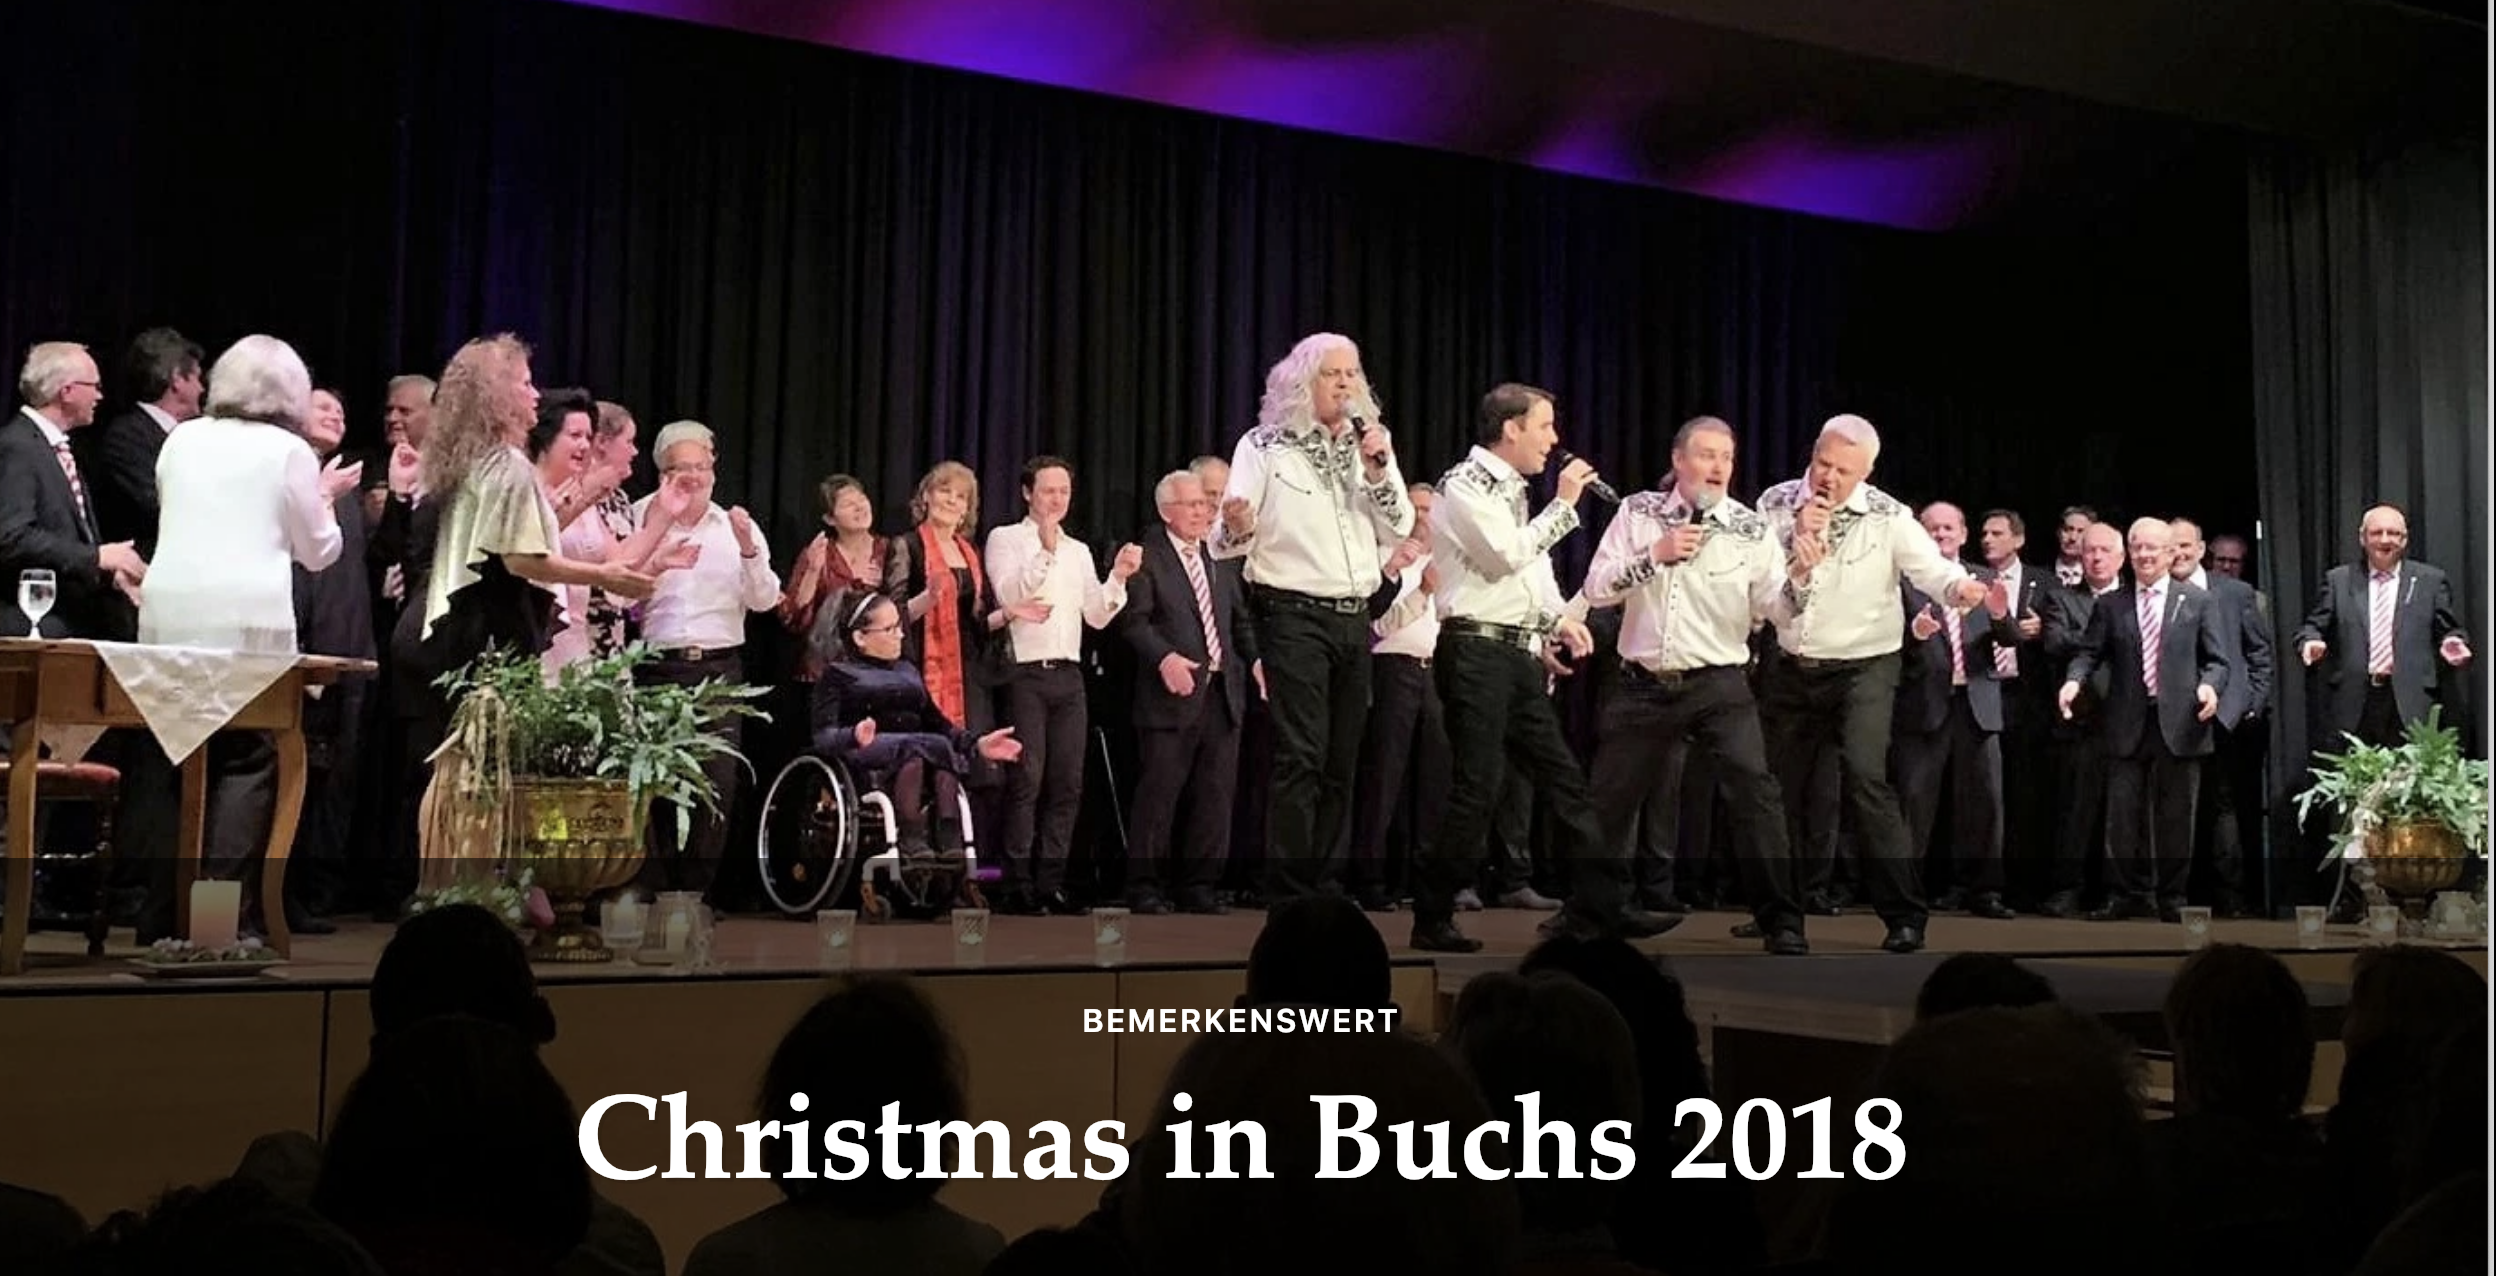 christmas in buchs 2018